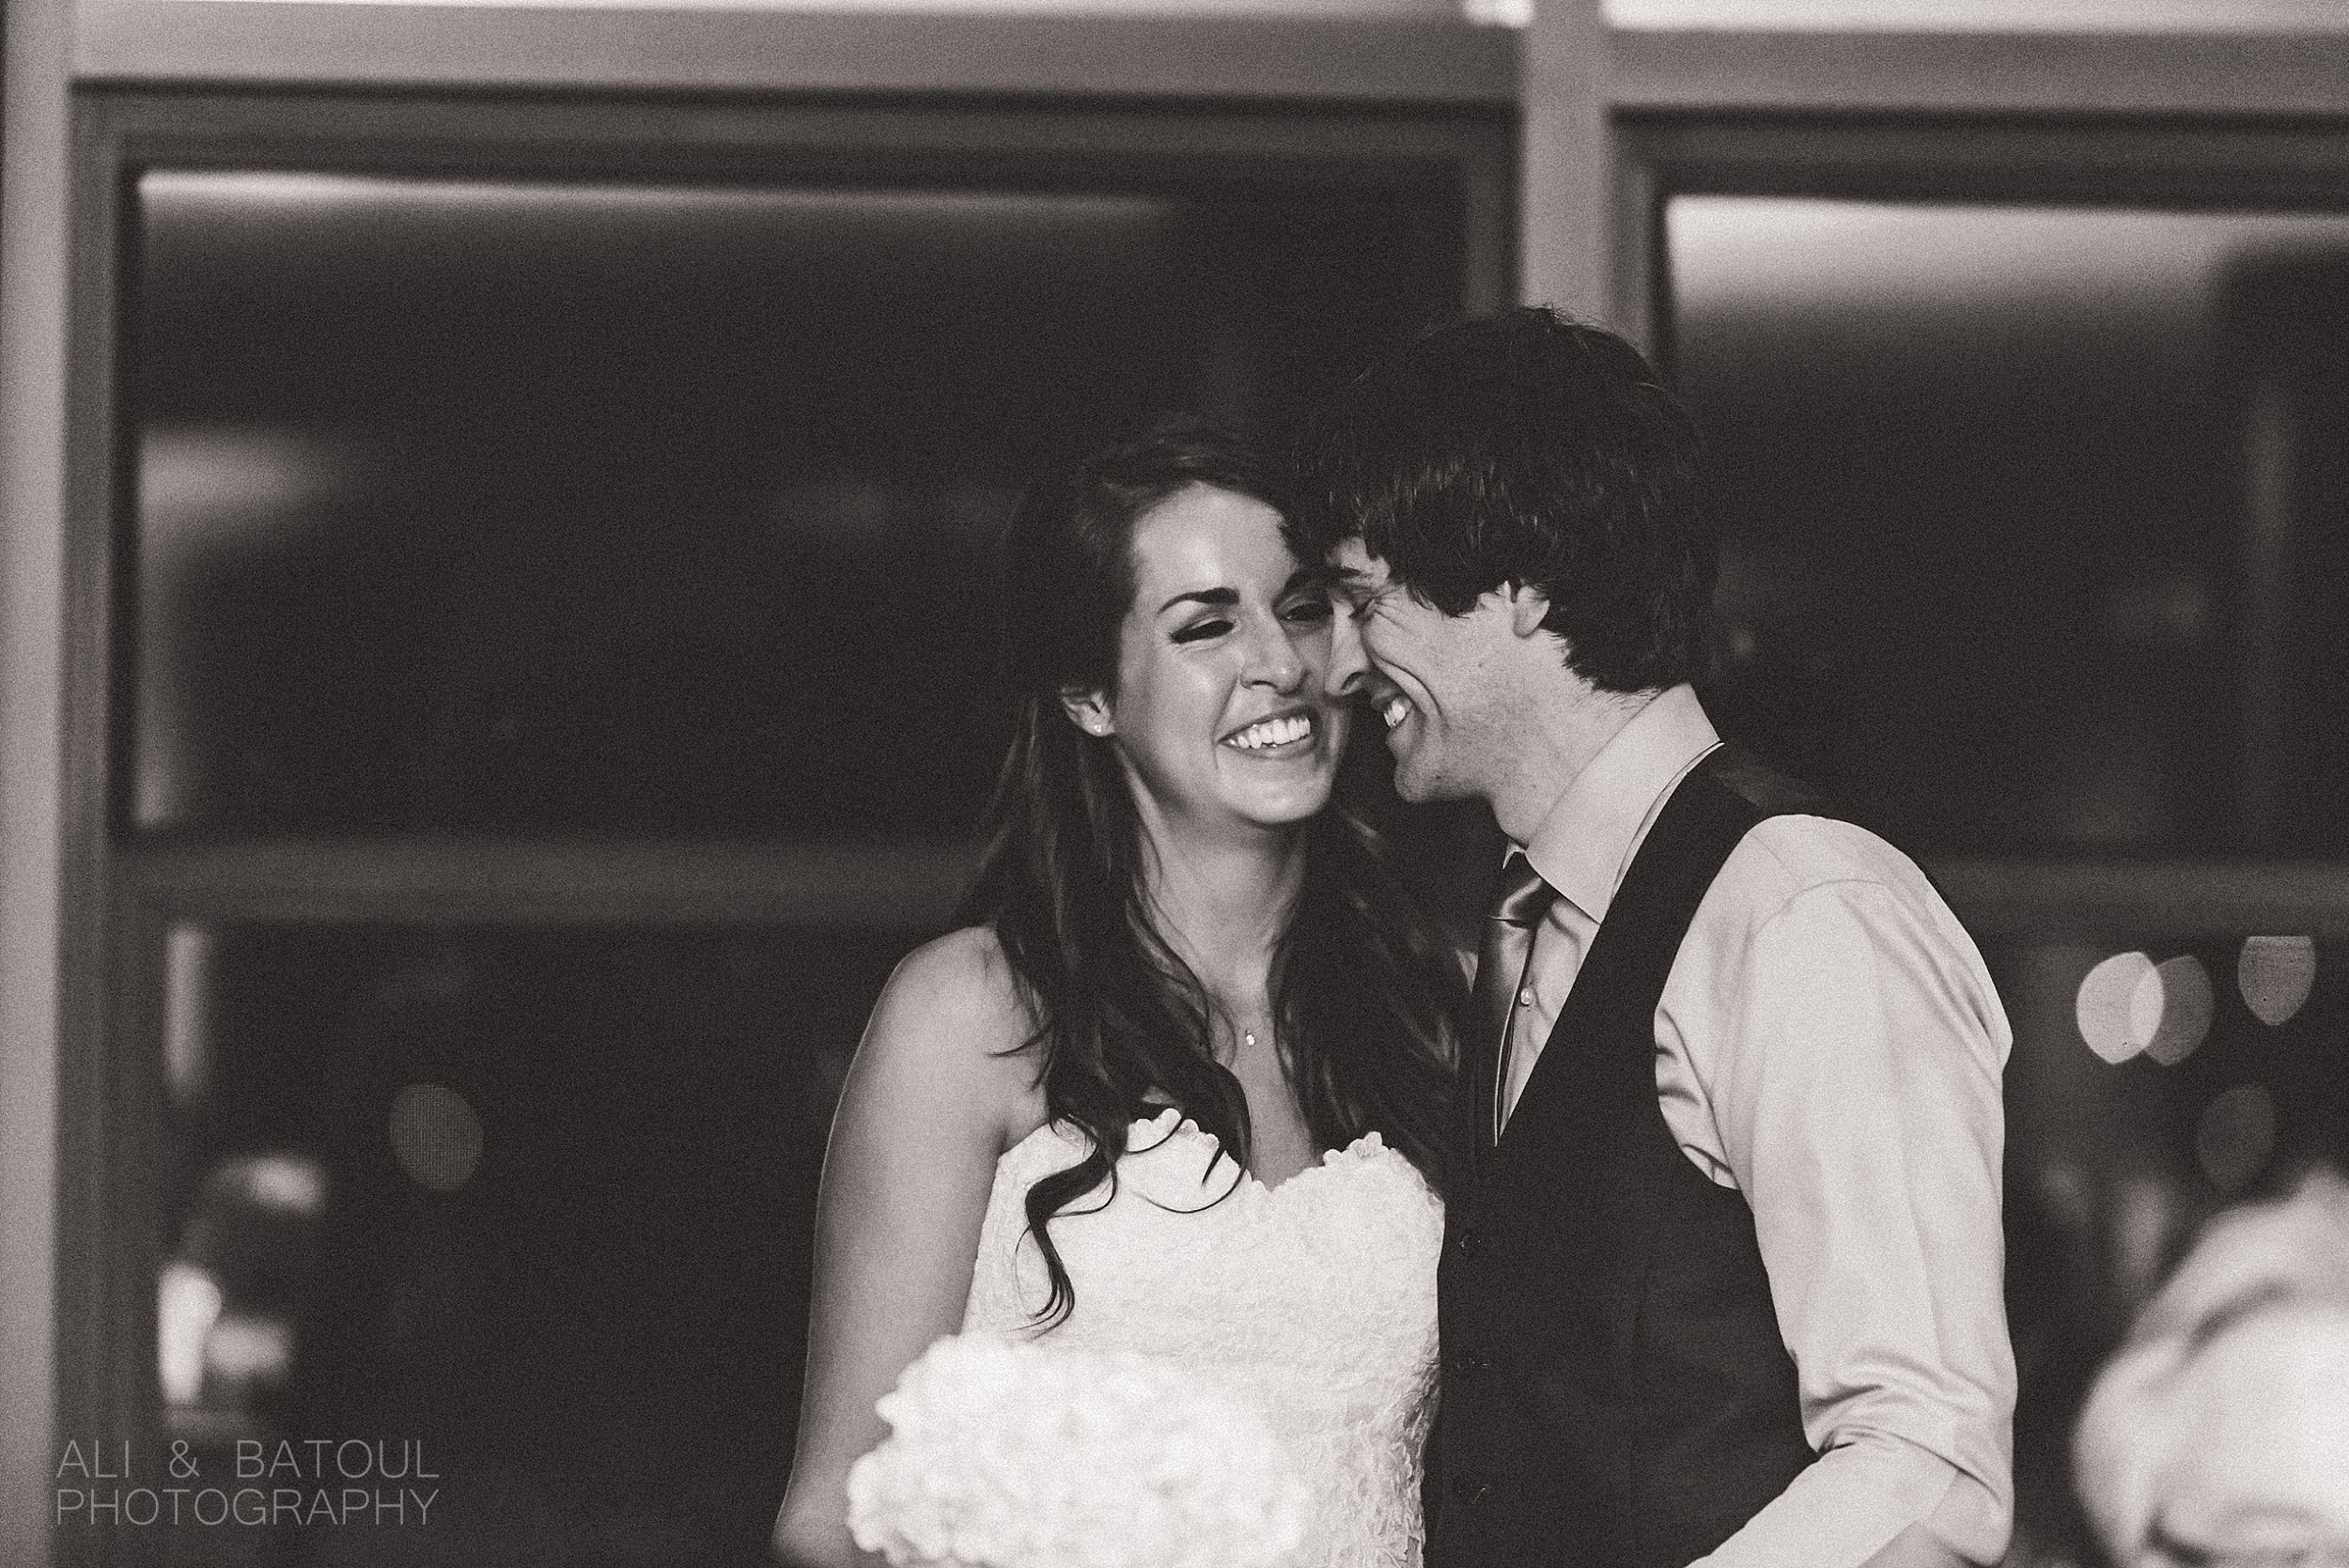 Ali & Batoul Photography - Documentary Fine Art Ottawa Wedding Photography_0091.jpg